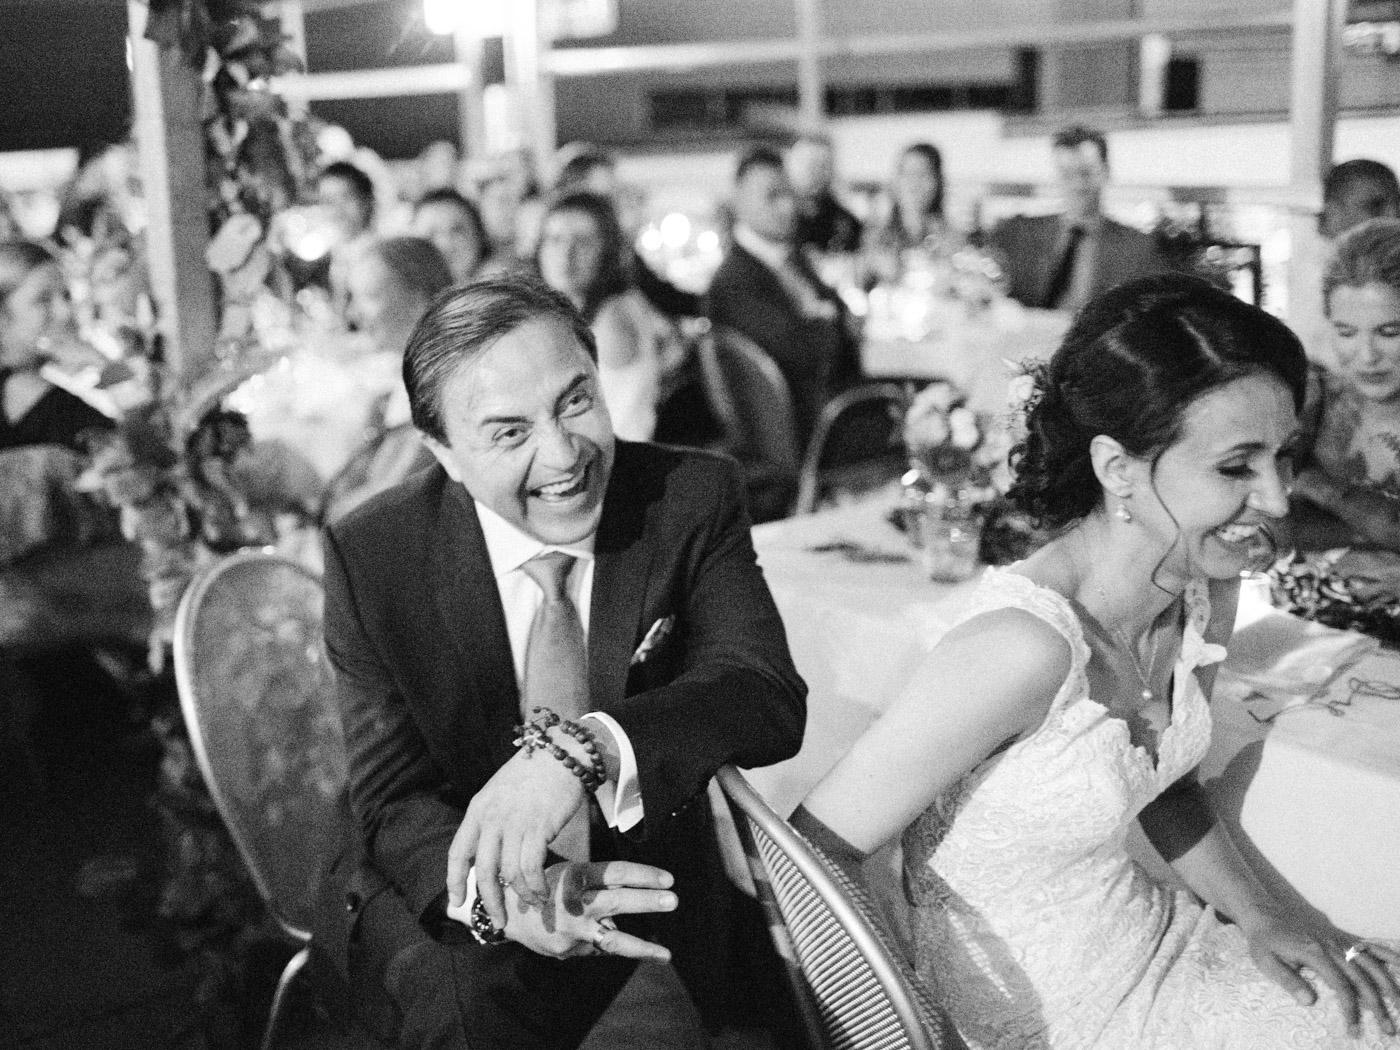 toronto_wedding_photographer_fine_art_documentary-515.jpg